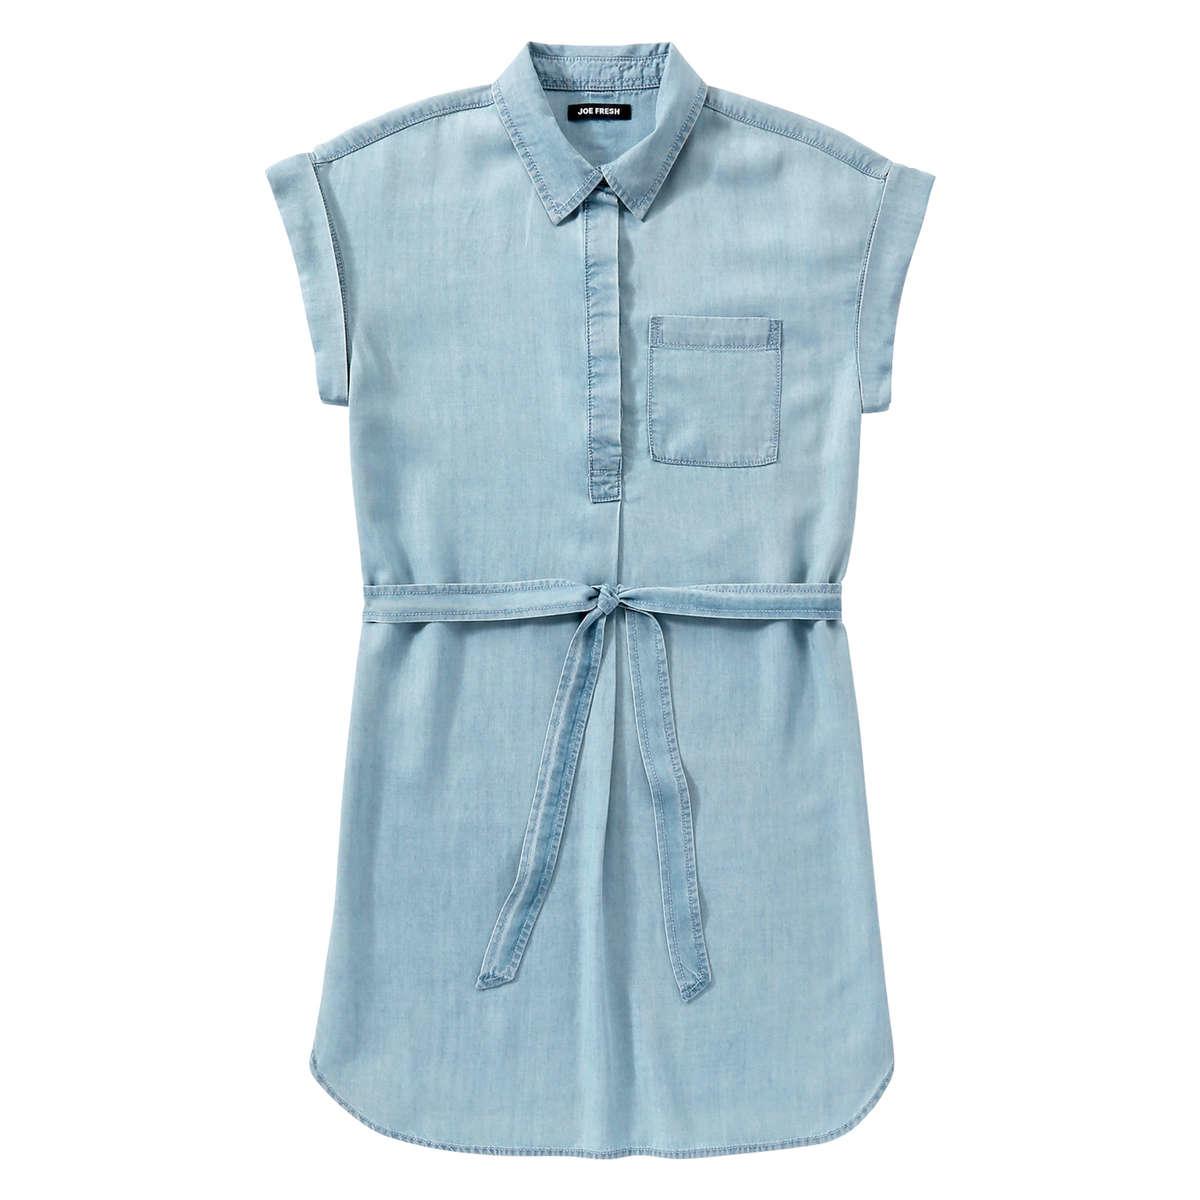 044dc827d1d Lyst - Joe Fresh Denim Dress in Blue